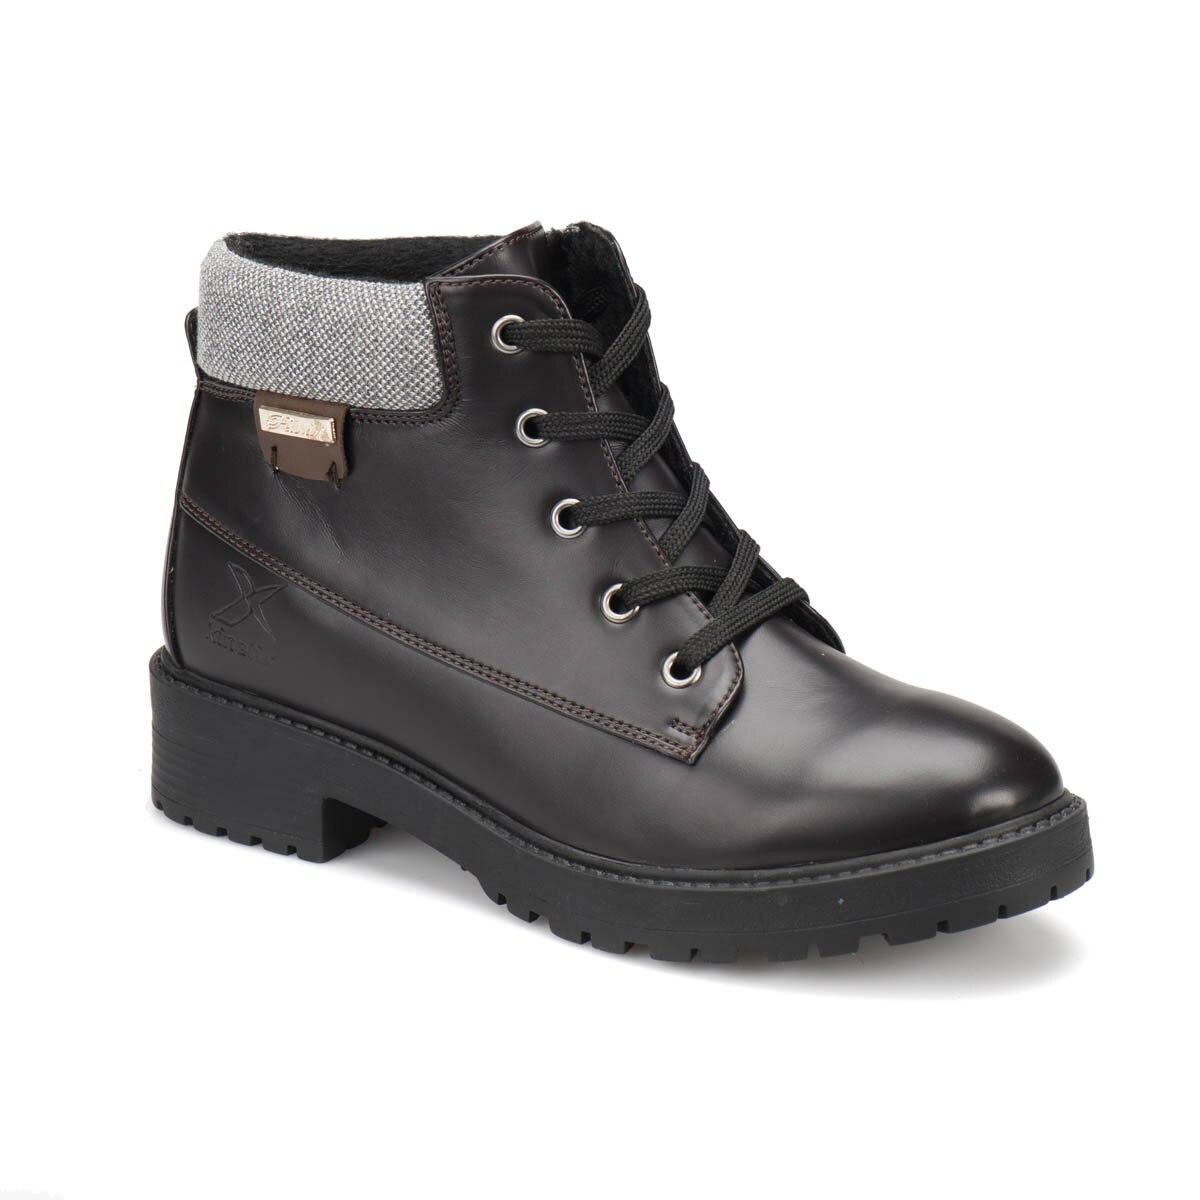 FLO LADO Brown Women 'S Boots KINETIX